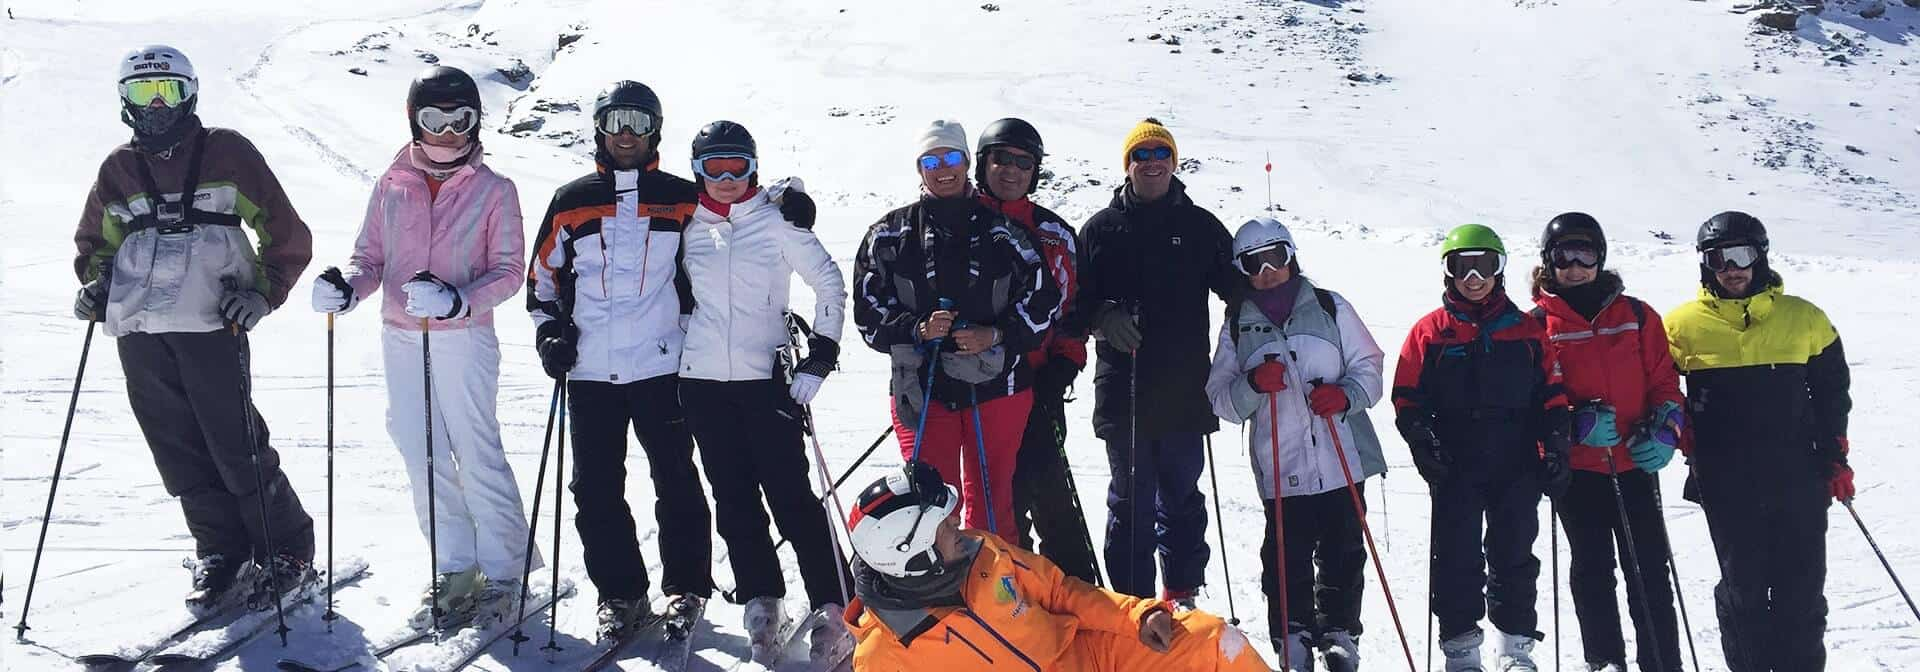 cursillos de ski en sierra nevada